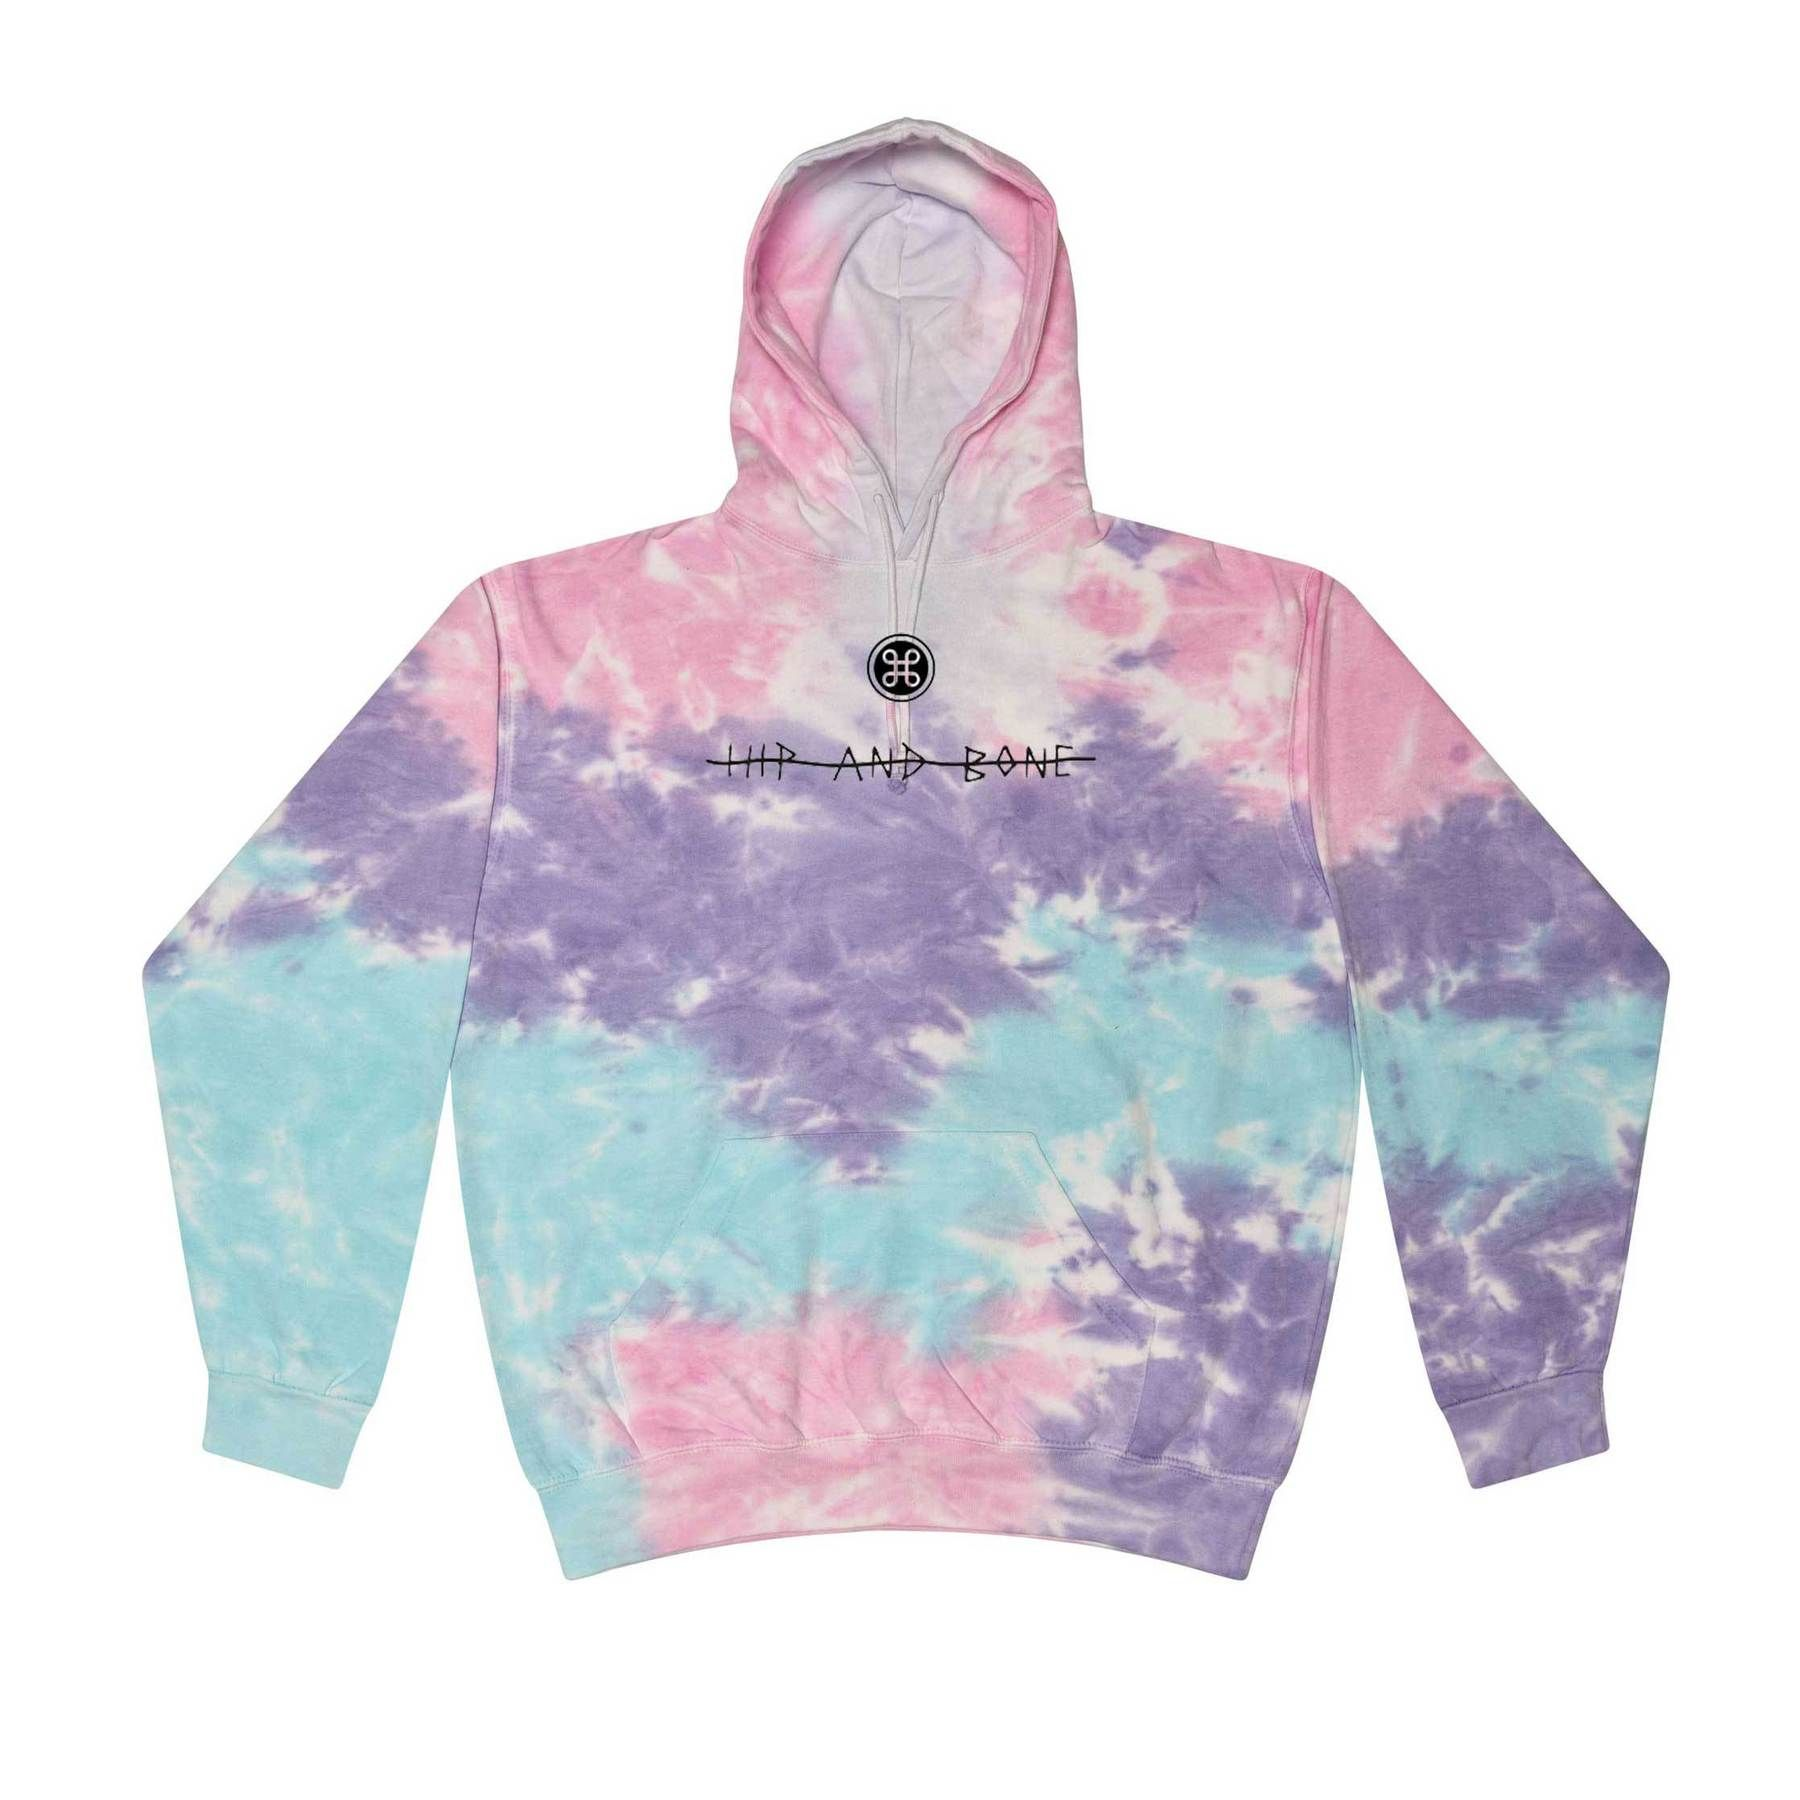 Spot Tie Dye Hoodie Cotton Candy Thedrop Com Tie Dye Hoodie Tie Dye Shirts Tie Dye Shirts Patterns [ 1800 x 1800 Pixel ]